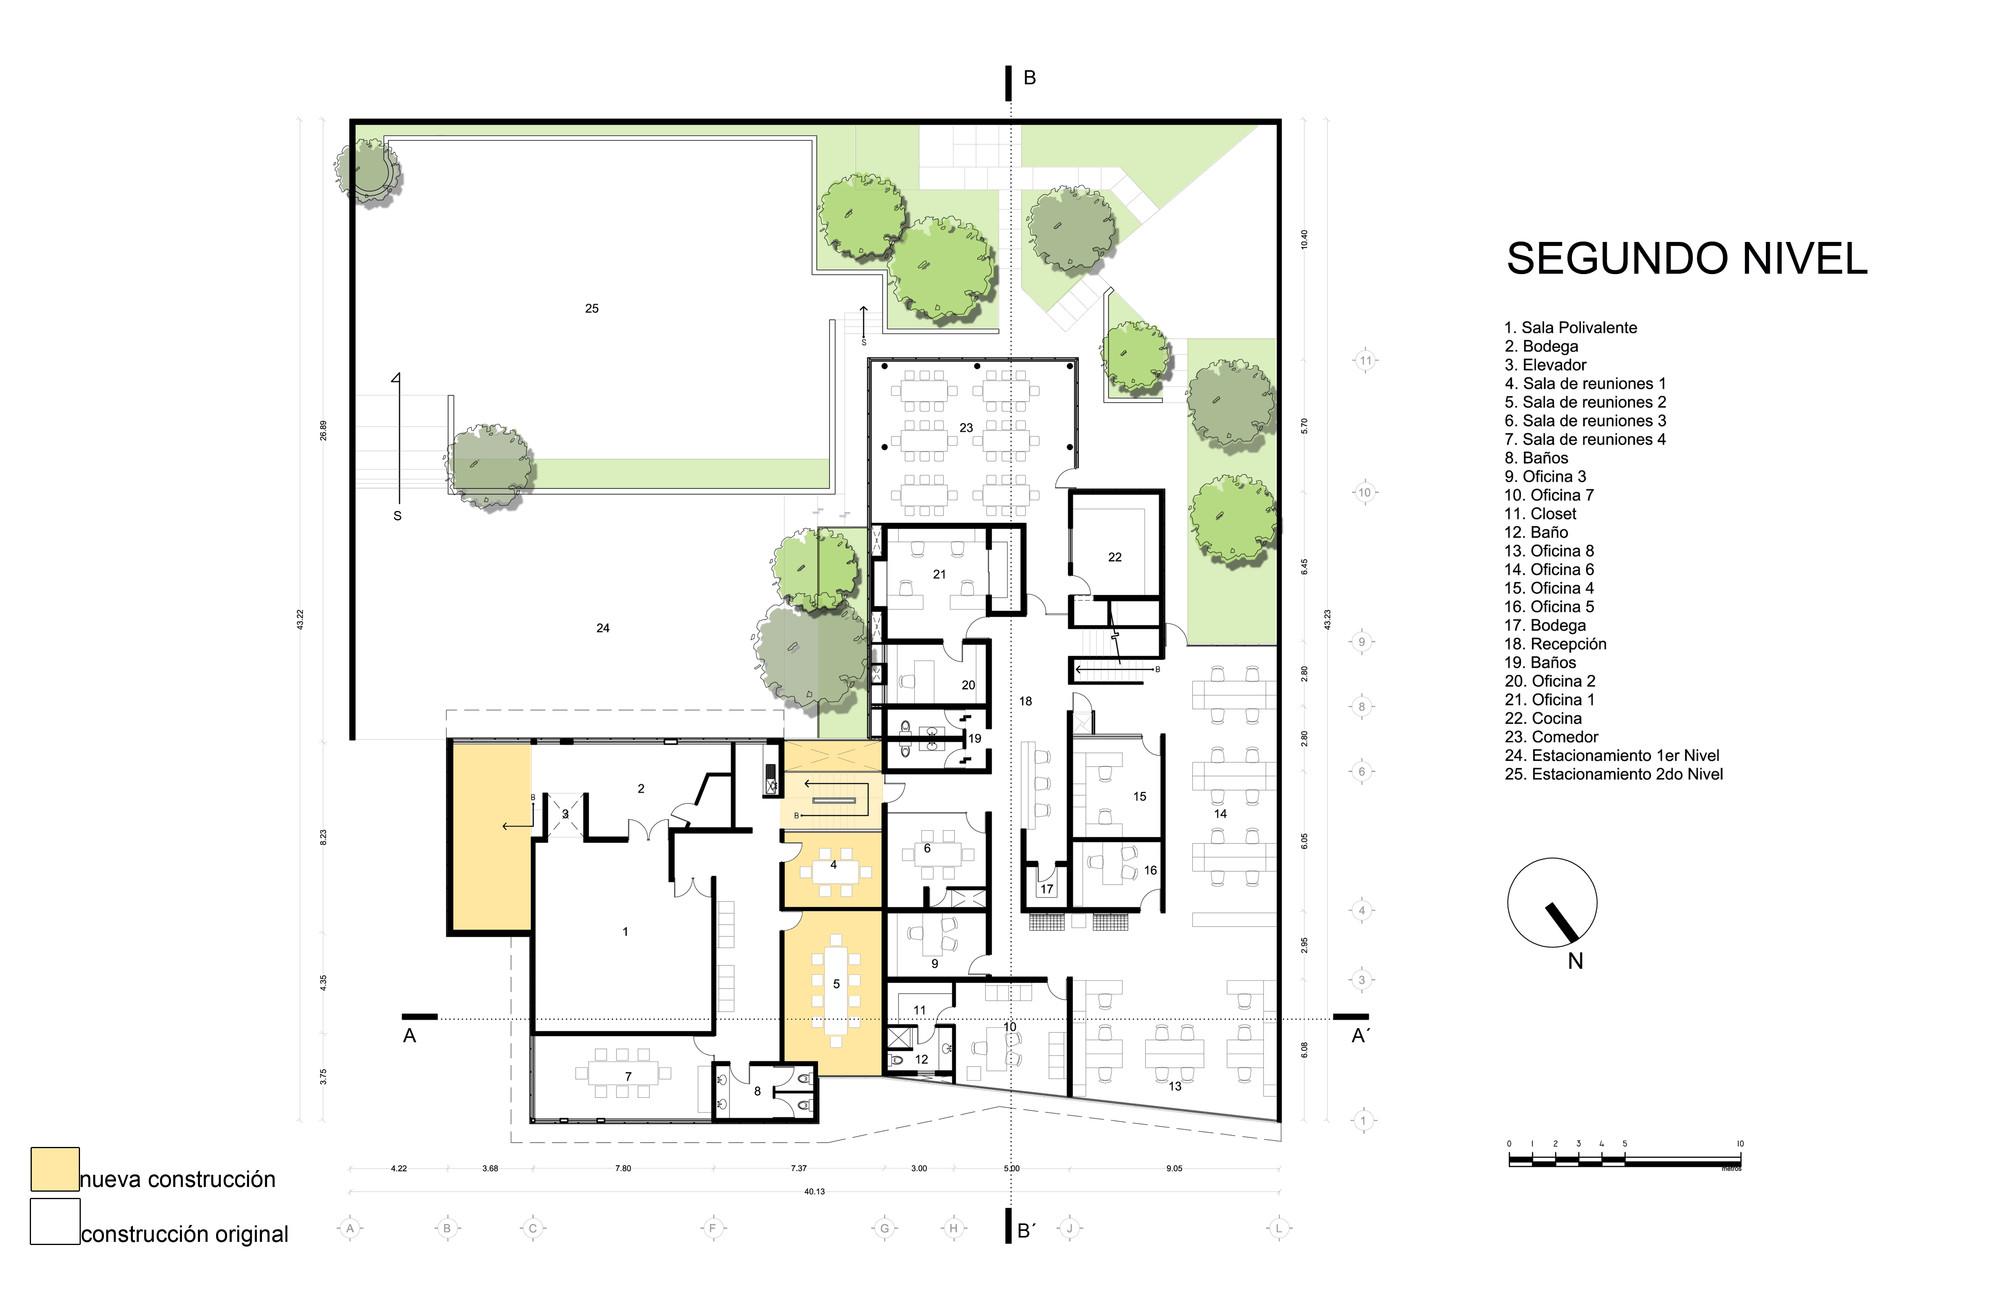 Edificio de oficinas total test aa c v arquitectos for Oficinas planta arquitectonica